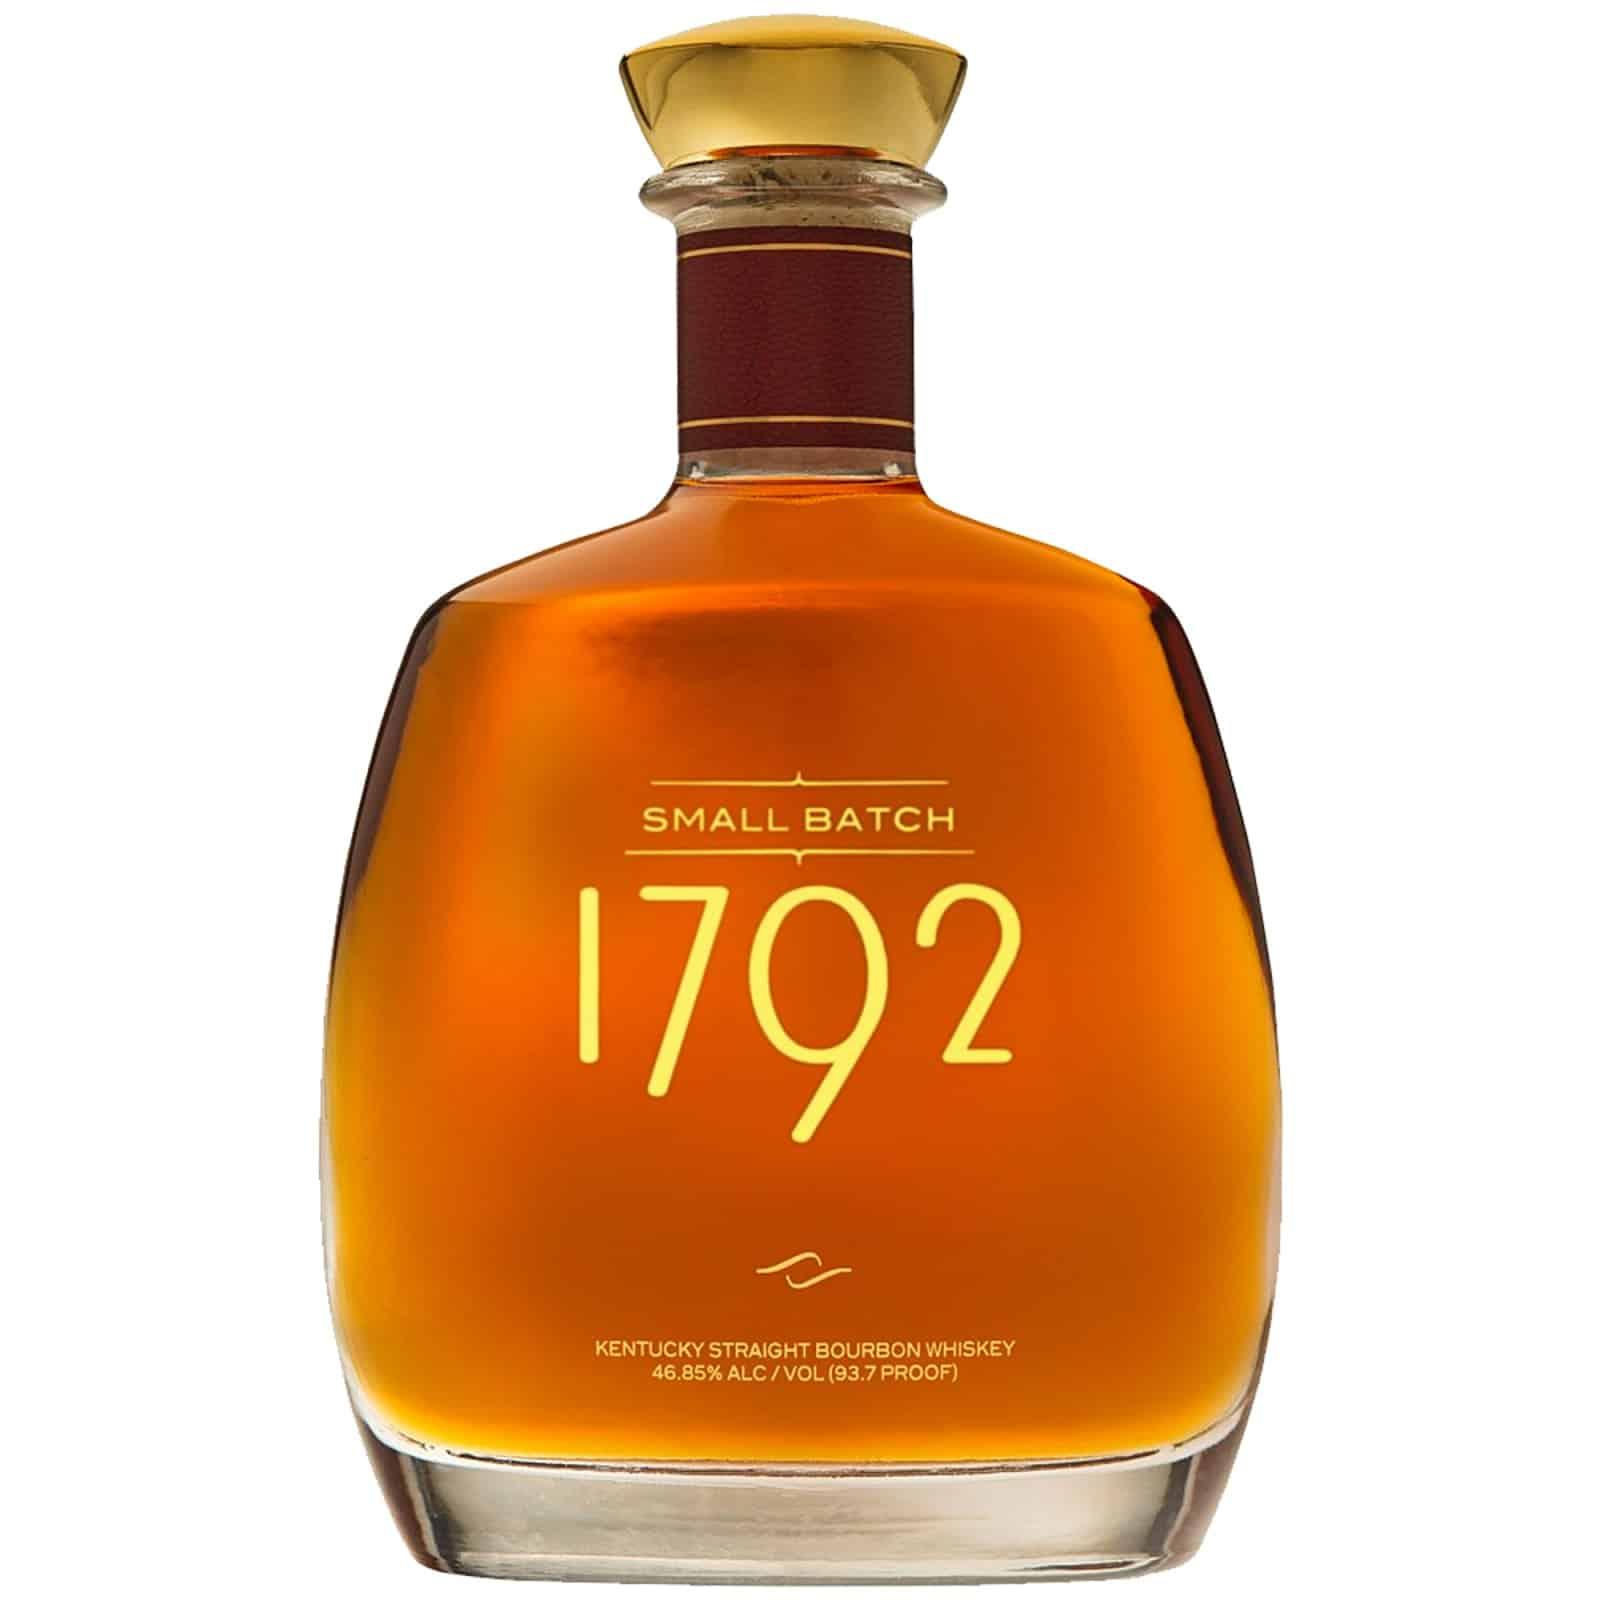 1792 Small Batch - Kentucky Straight Bourbon Whiskey